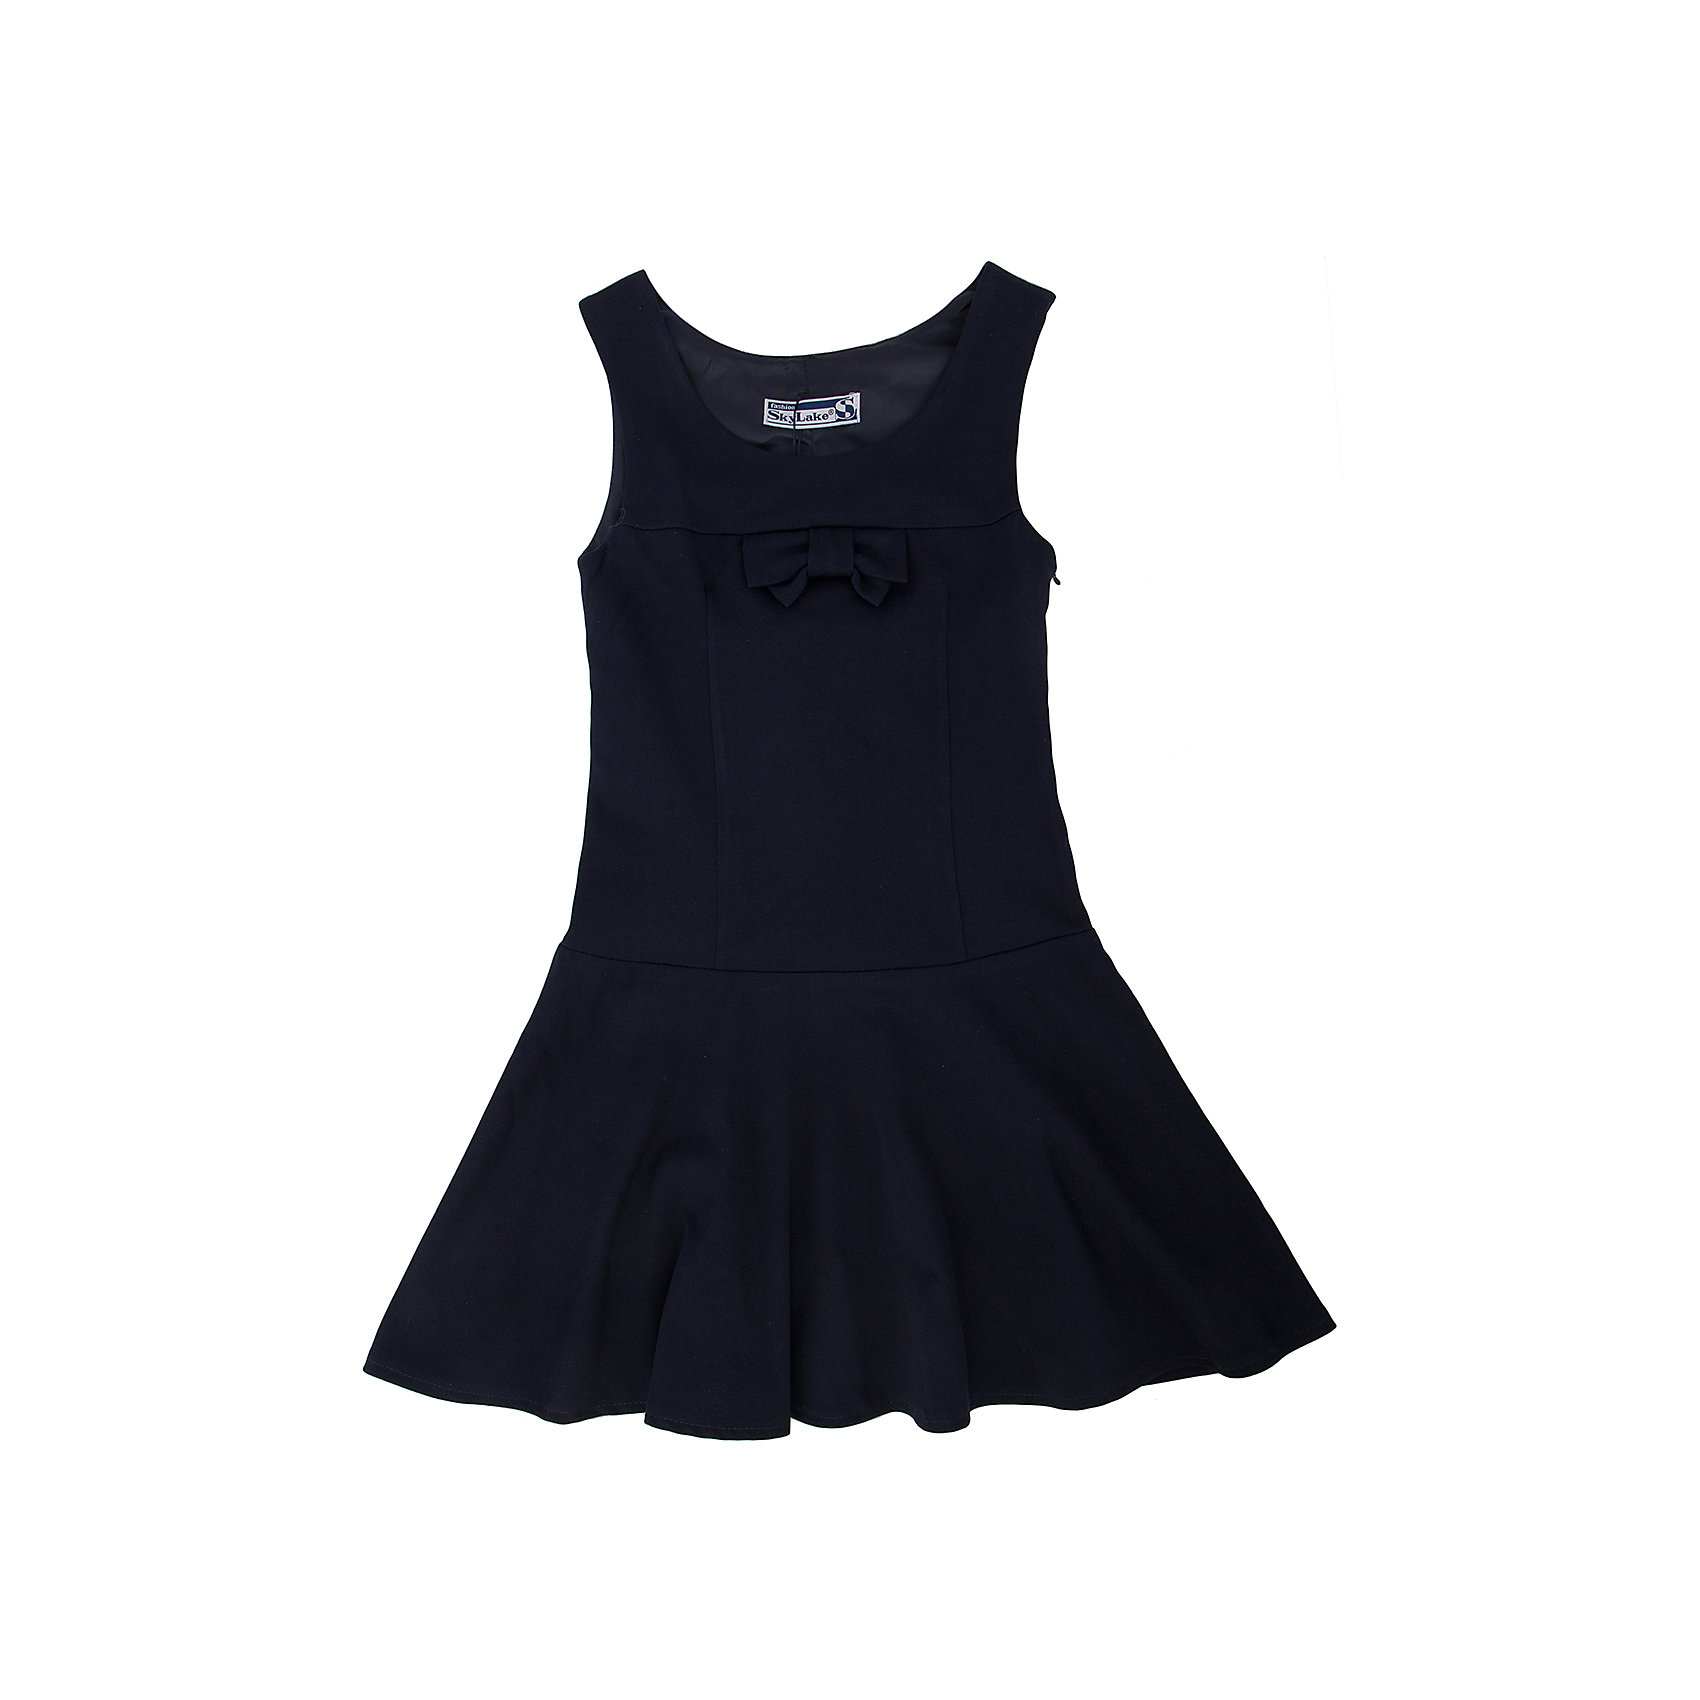 Skylake Сарафан для девочки Рио-Габардин Skylake skylake юбка для девочки агат skylake